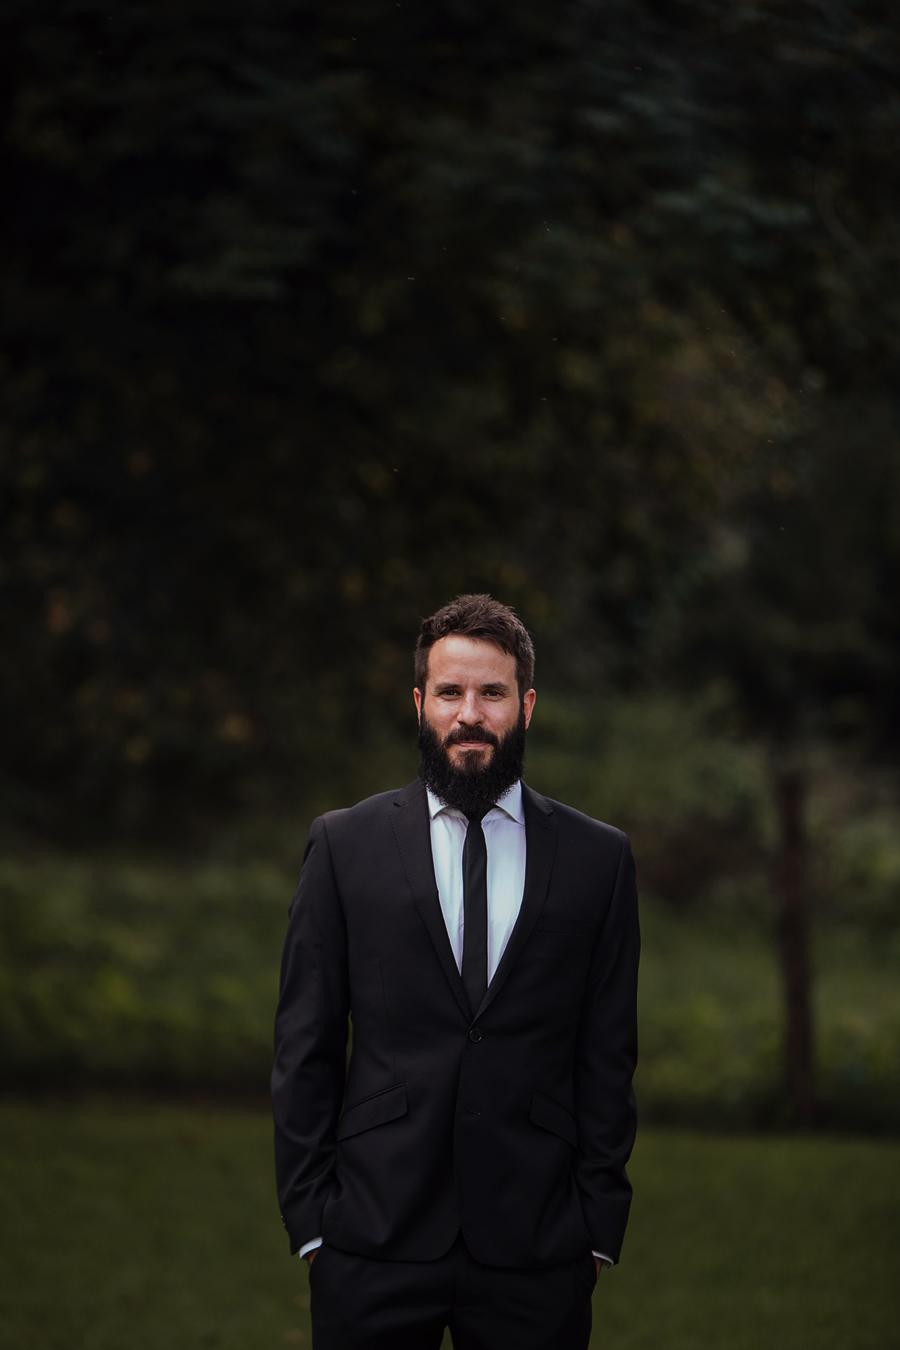 poroka_wedding_hochzeit_albumweddings_JN_Orehovgaj_Slovenia04922.jpg